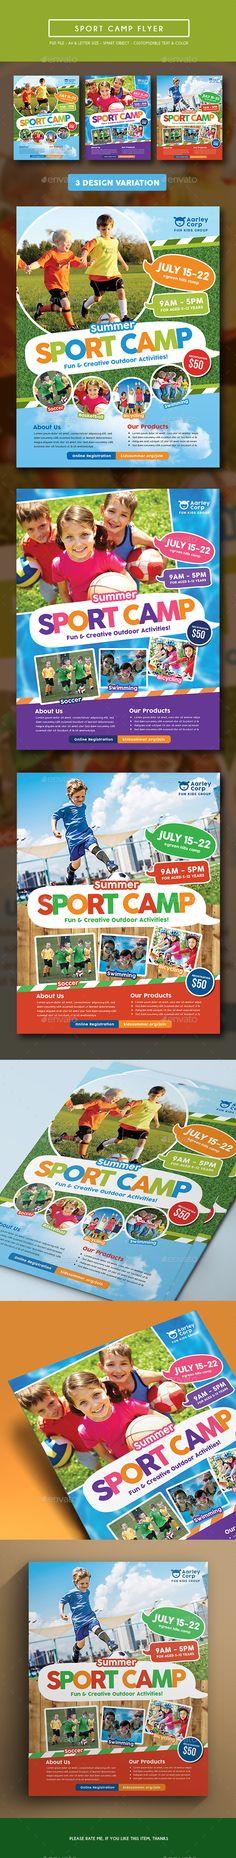 Sport Camp Flyer Template PSD. Download here: http://graphicriver.net/item/sport-camp-flyer/15373514?ref=ksioks